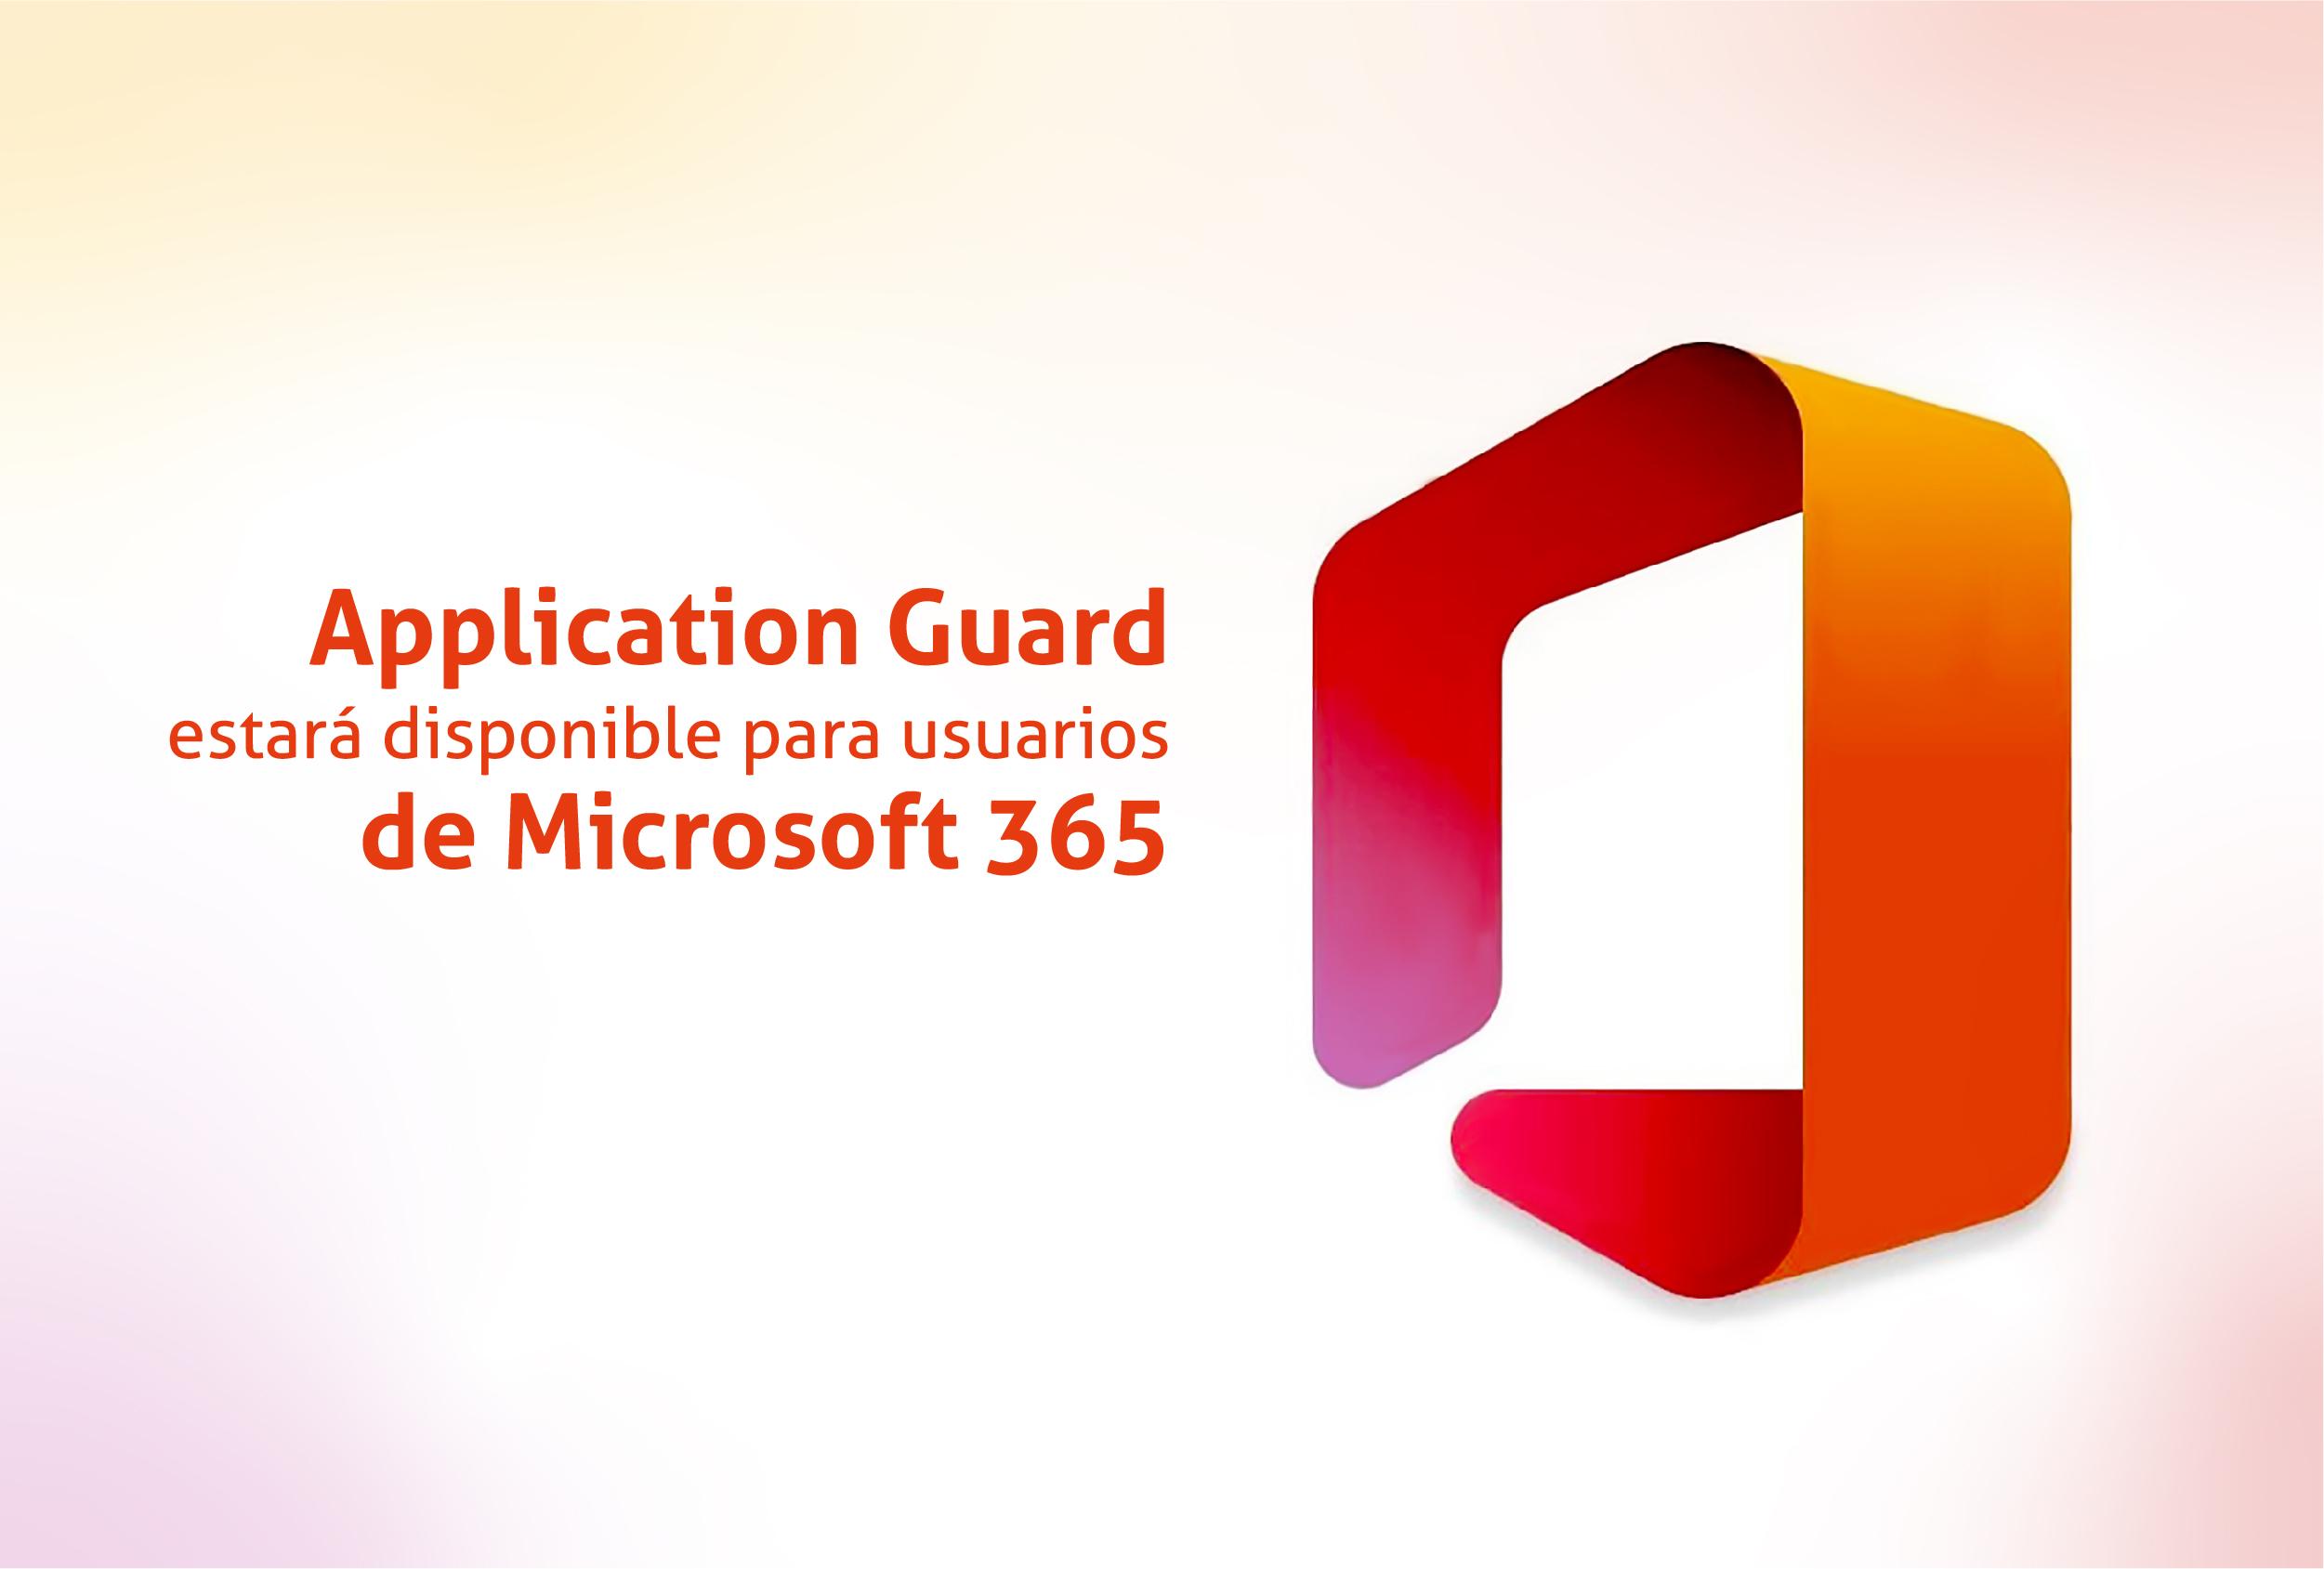 Application Guard